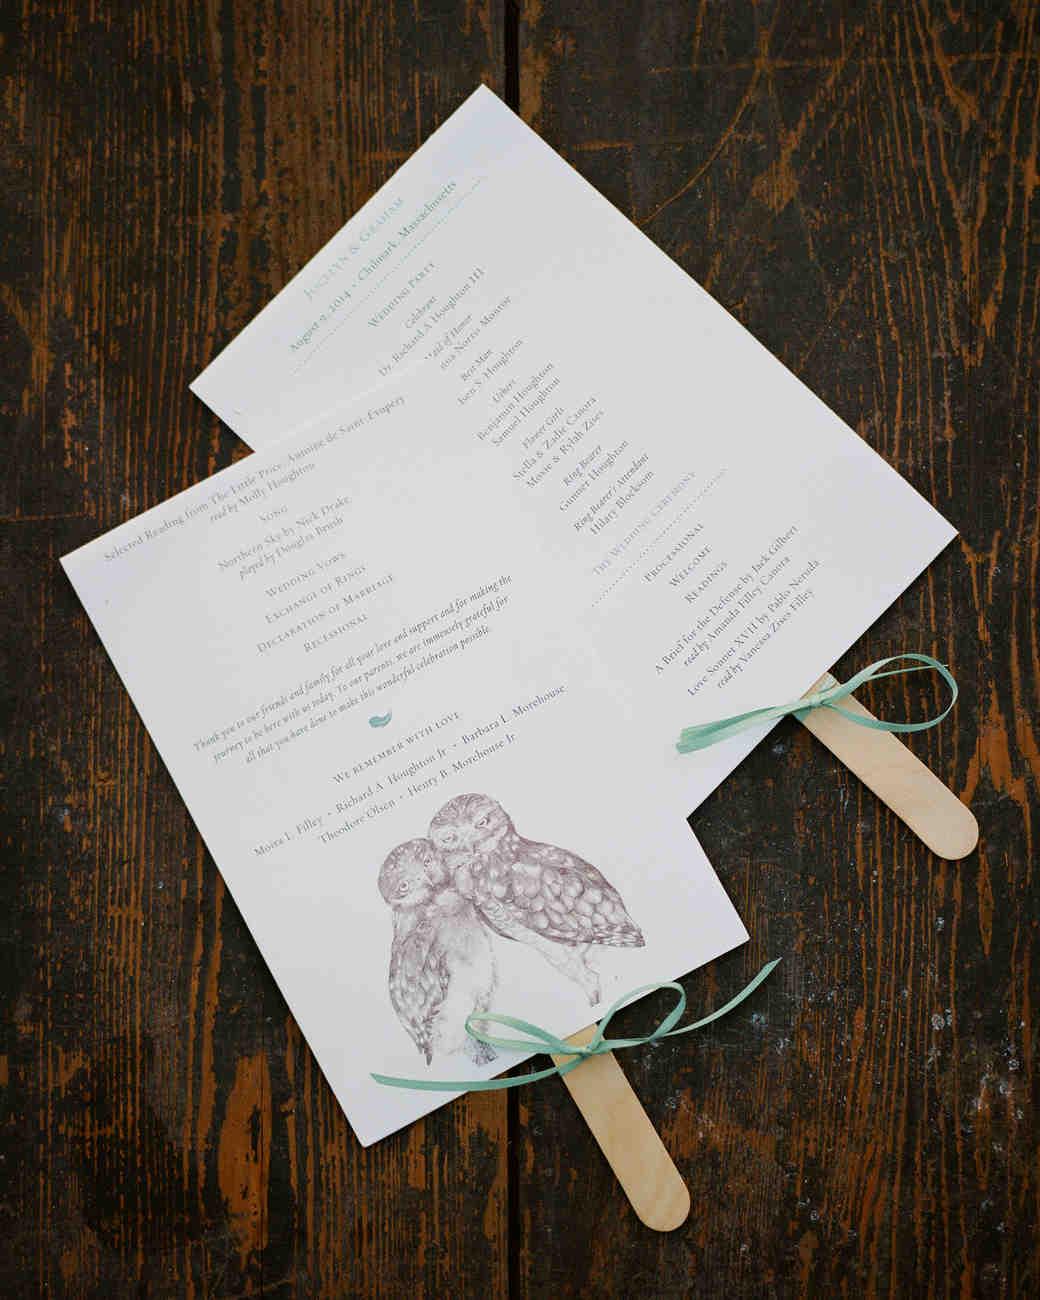 jocelyn-graham-wedding-programs-1136-s111847-0315.jpg